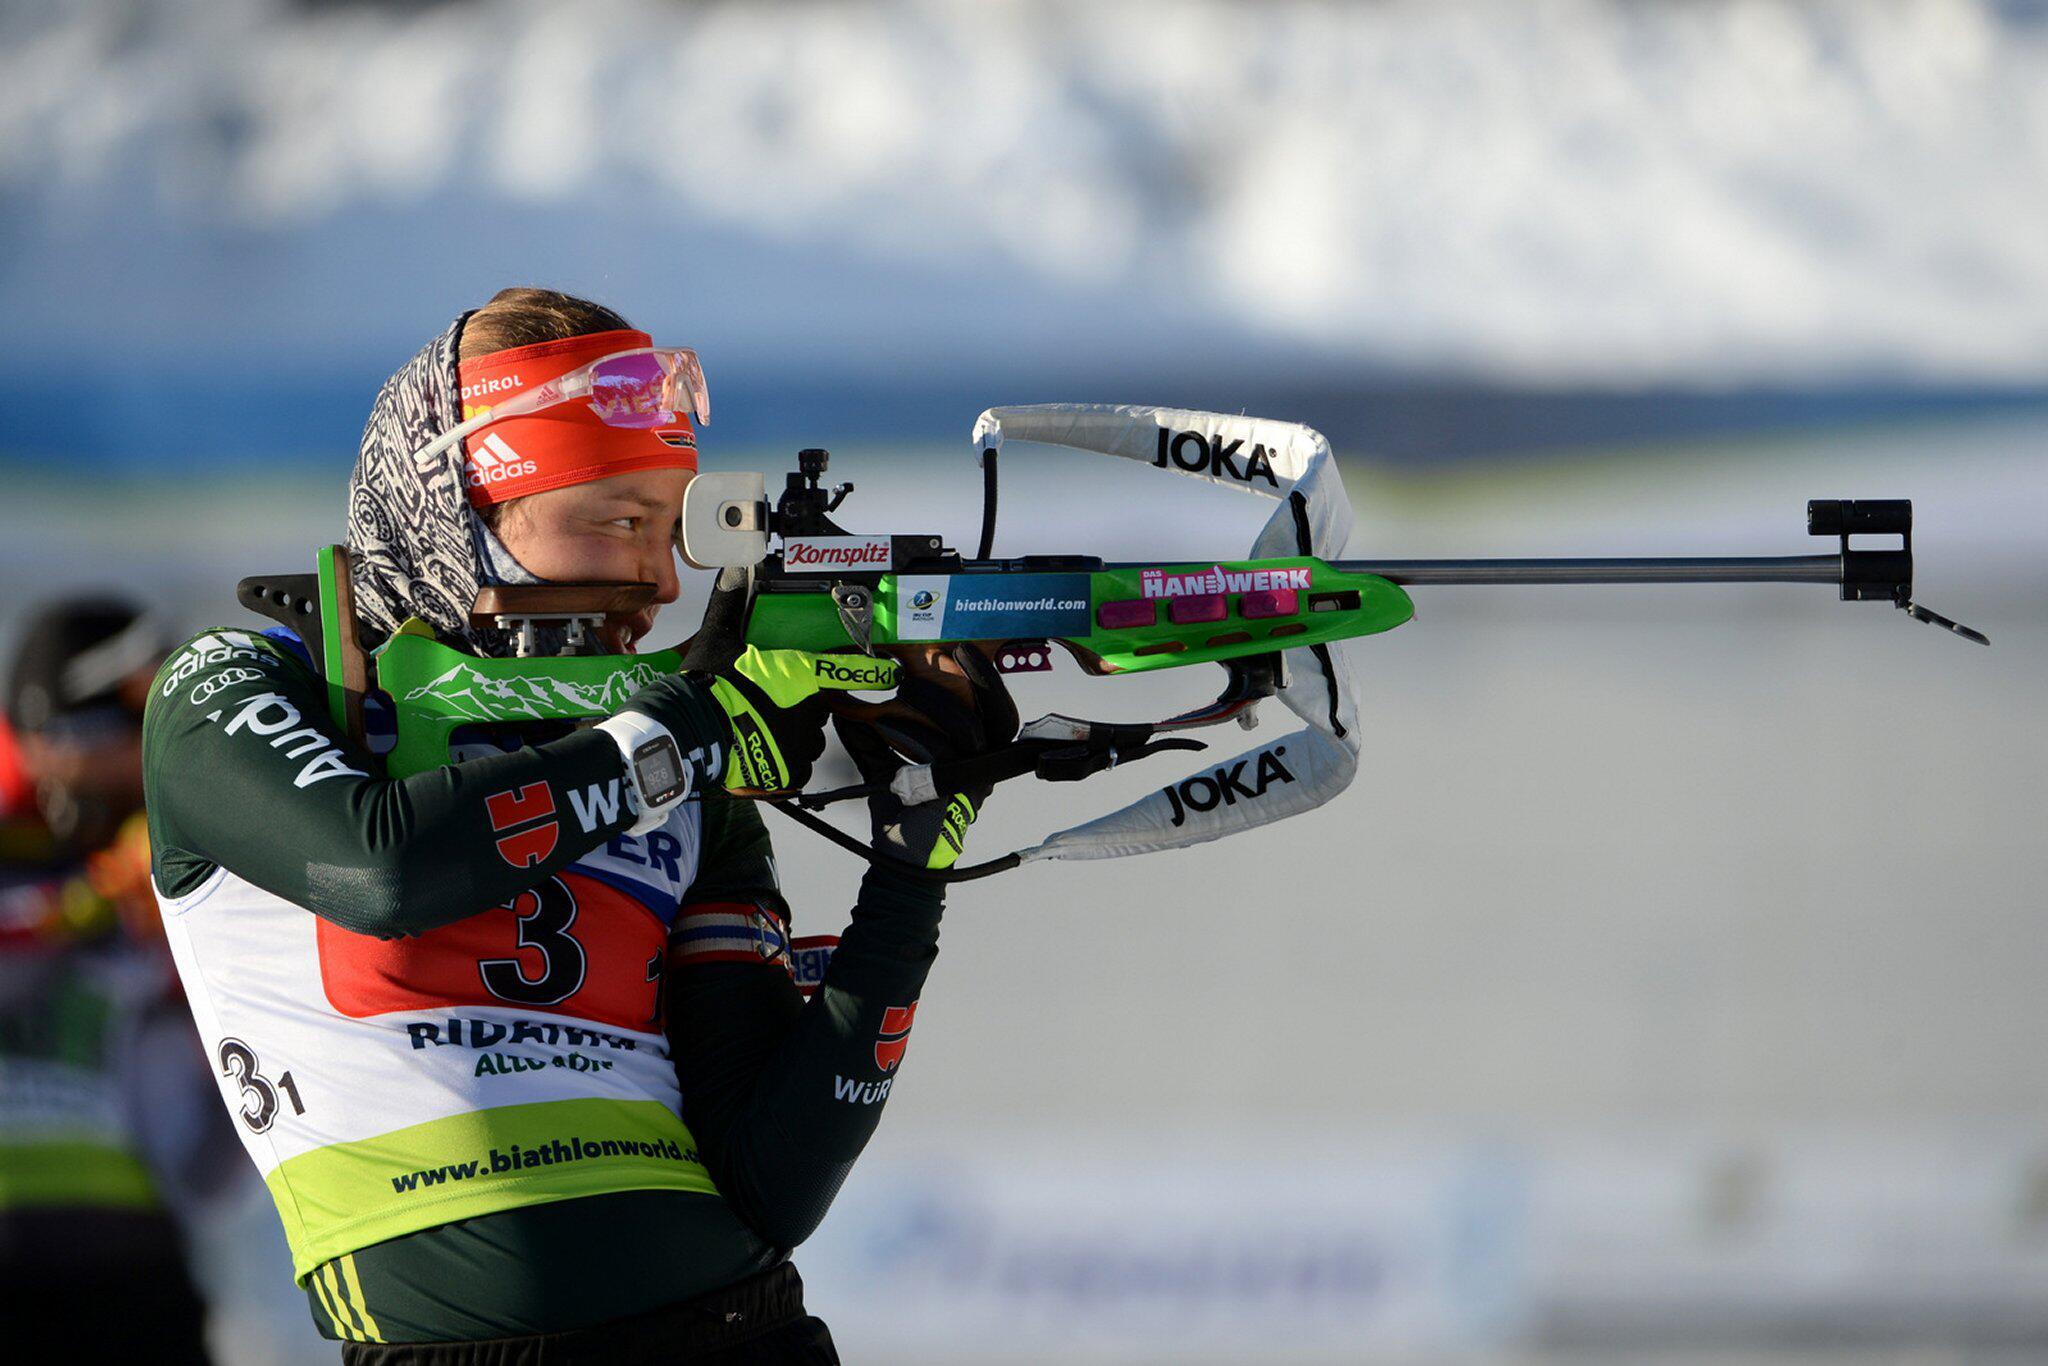 Bild zu IBU-Cup, Ridnaun, Laura Dahlmeier, Mixed-Staffel